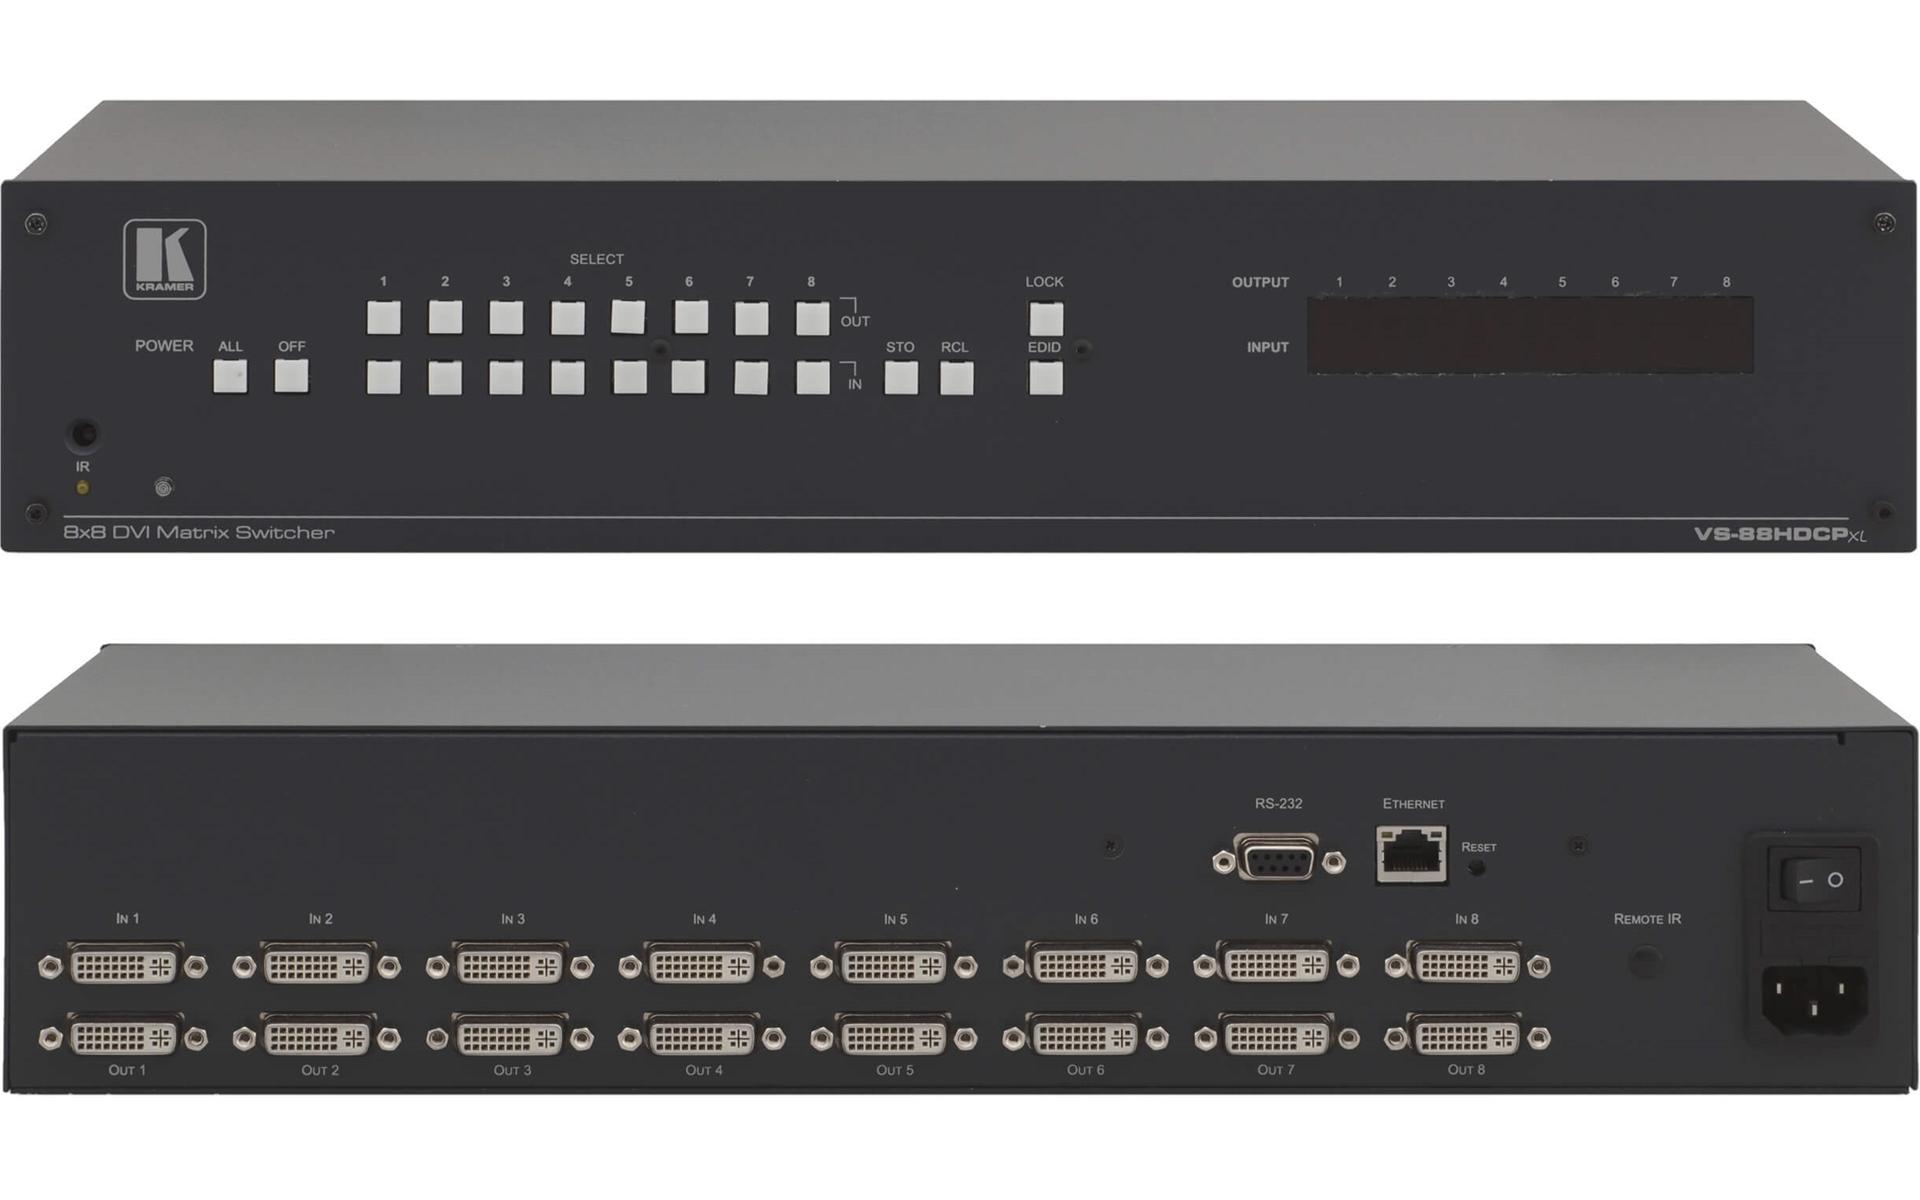 Buy kramer vs 88hdcpxl 8x8 dvi matrix switcher hdcp hdmi v 14 kramer vs 88hdcpxl 8x8 dvi matrix switcher hdcp hdmi v 14 publicscrutiny Gallery